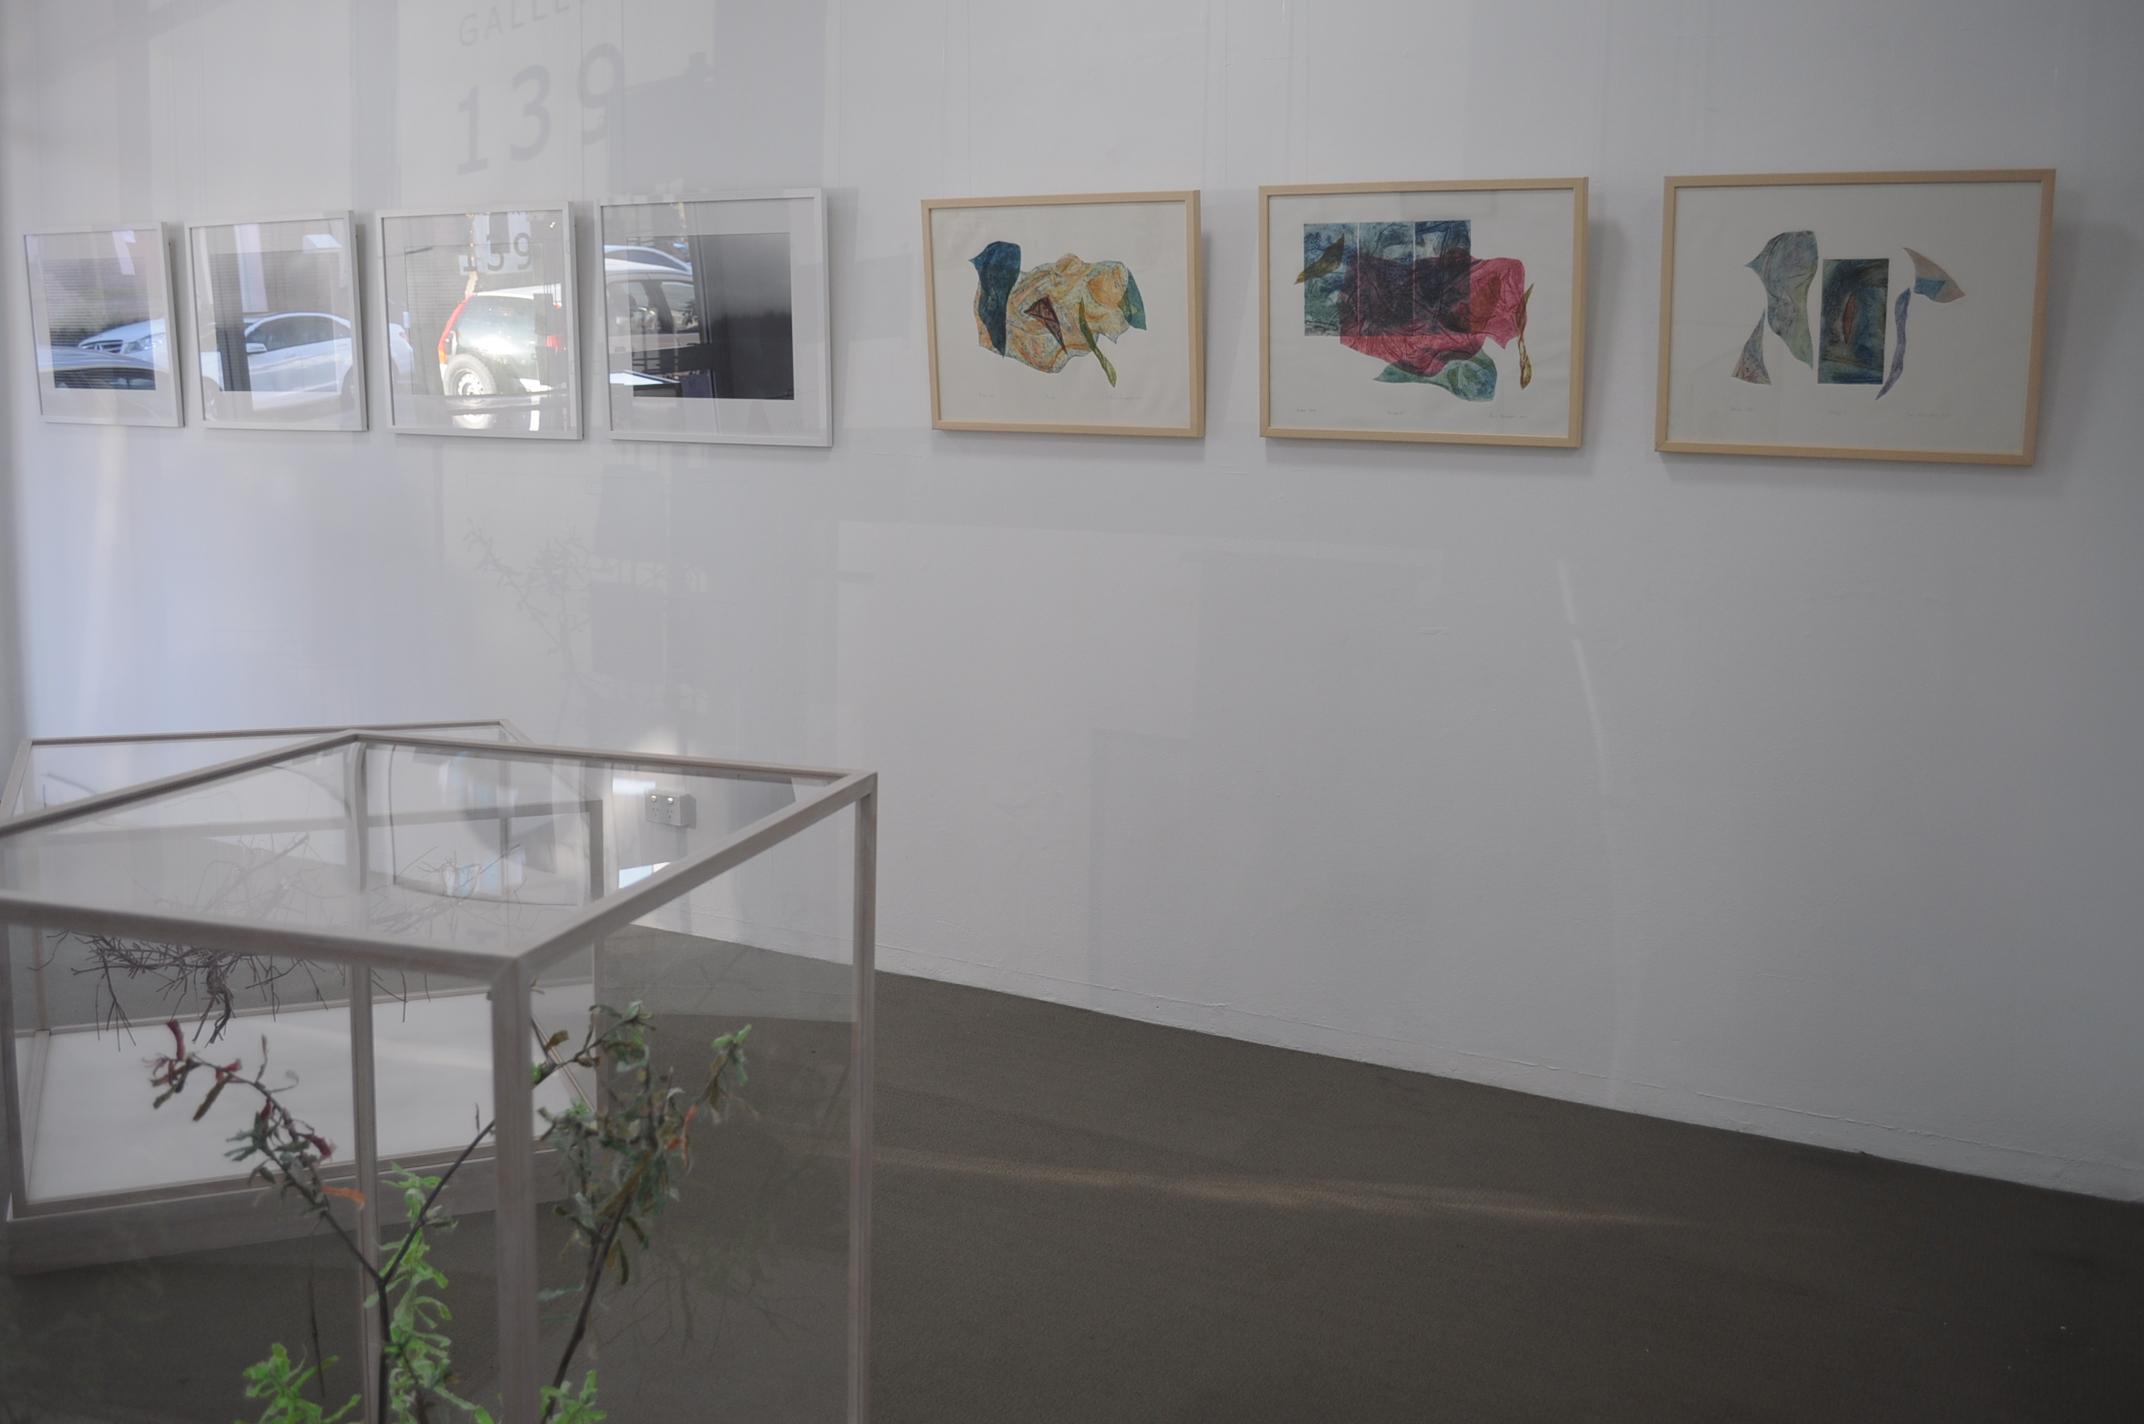 installation view (Chris Byrnes-photography, Anne McLaughlin-printmaking, Rieteka Geursen-paper sculpture)